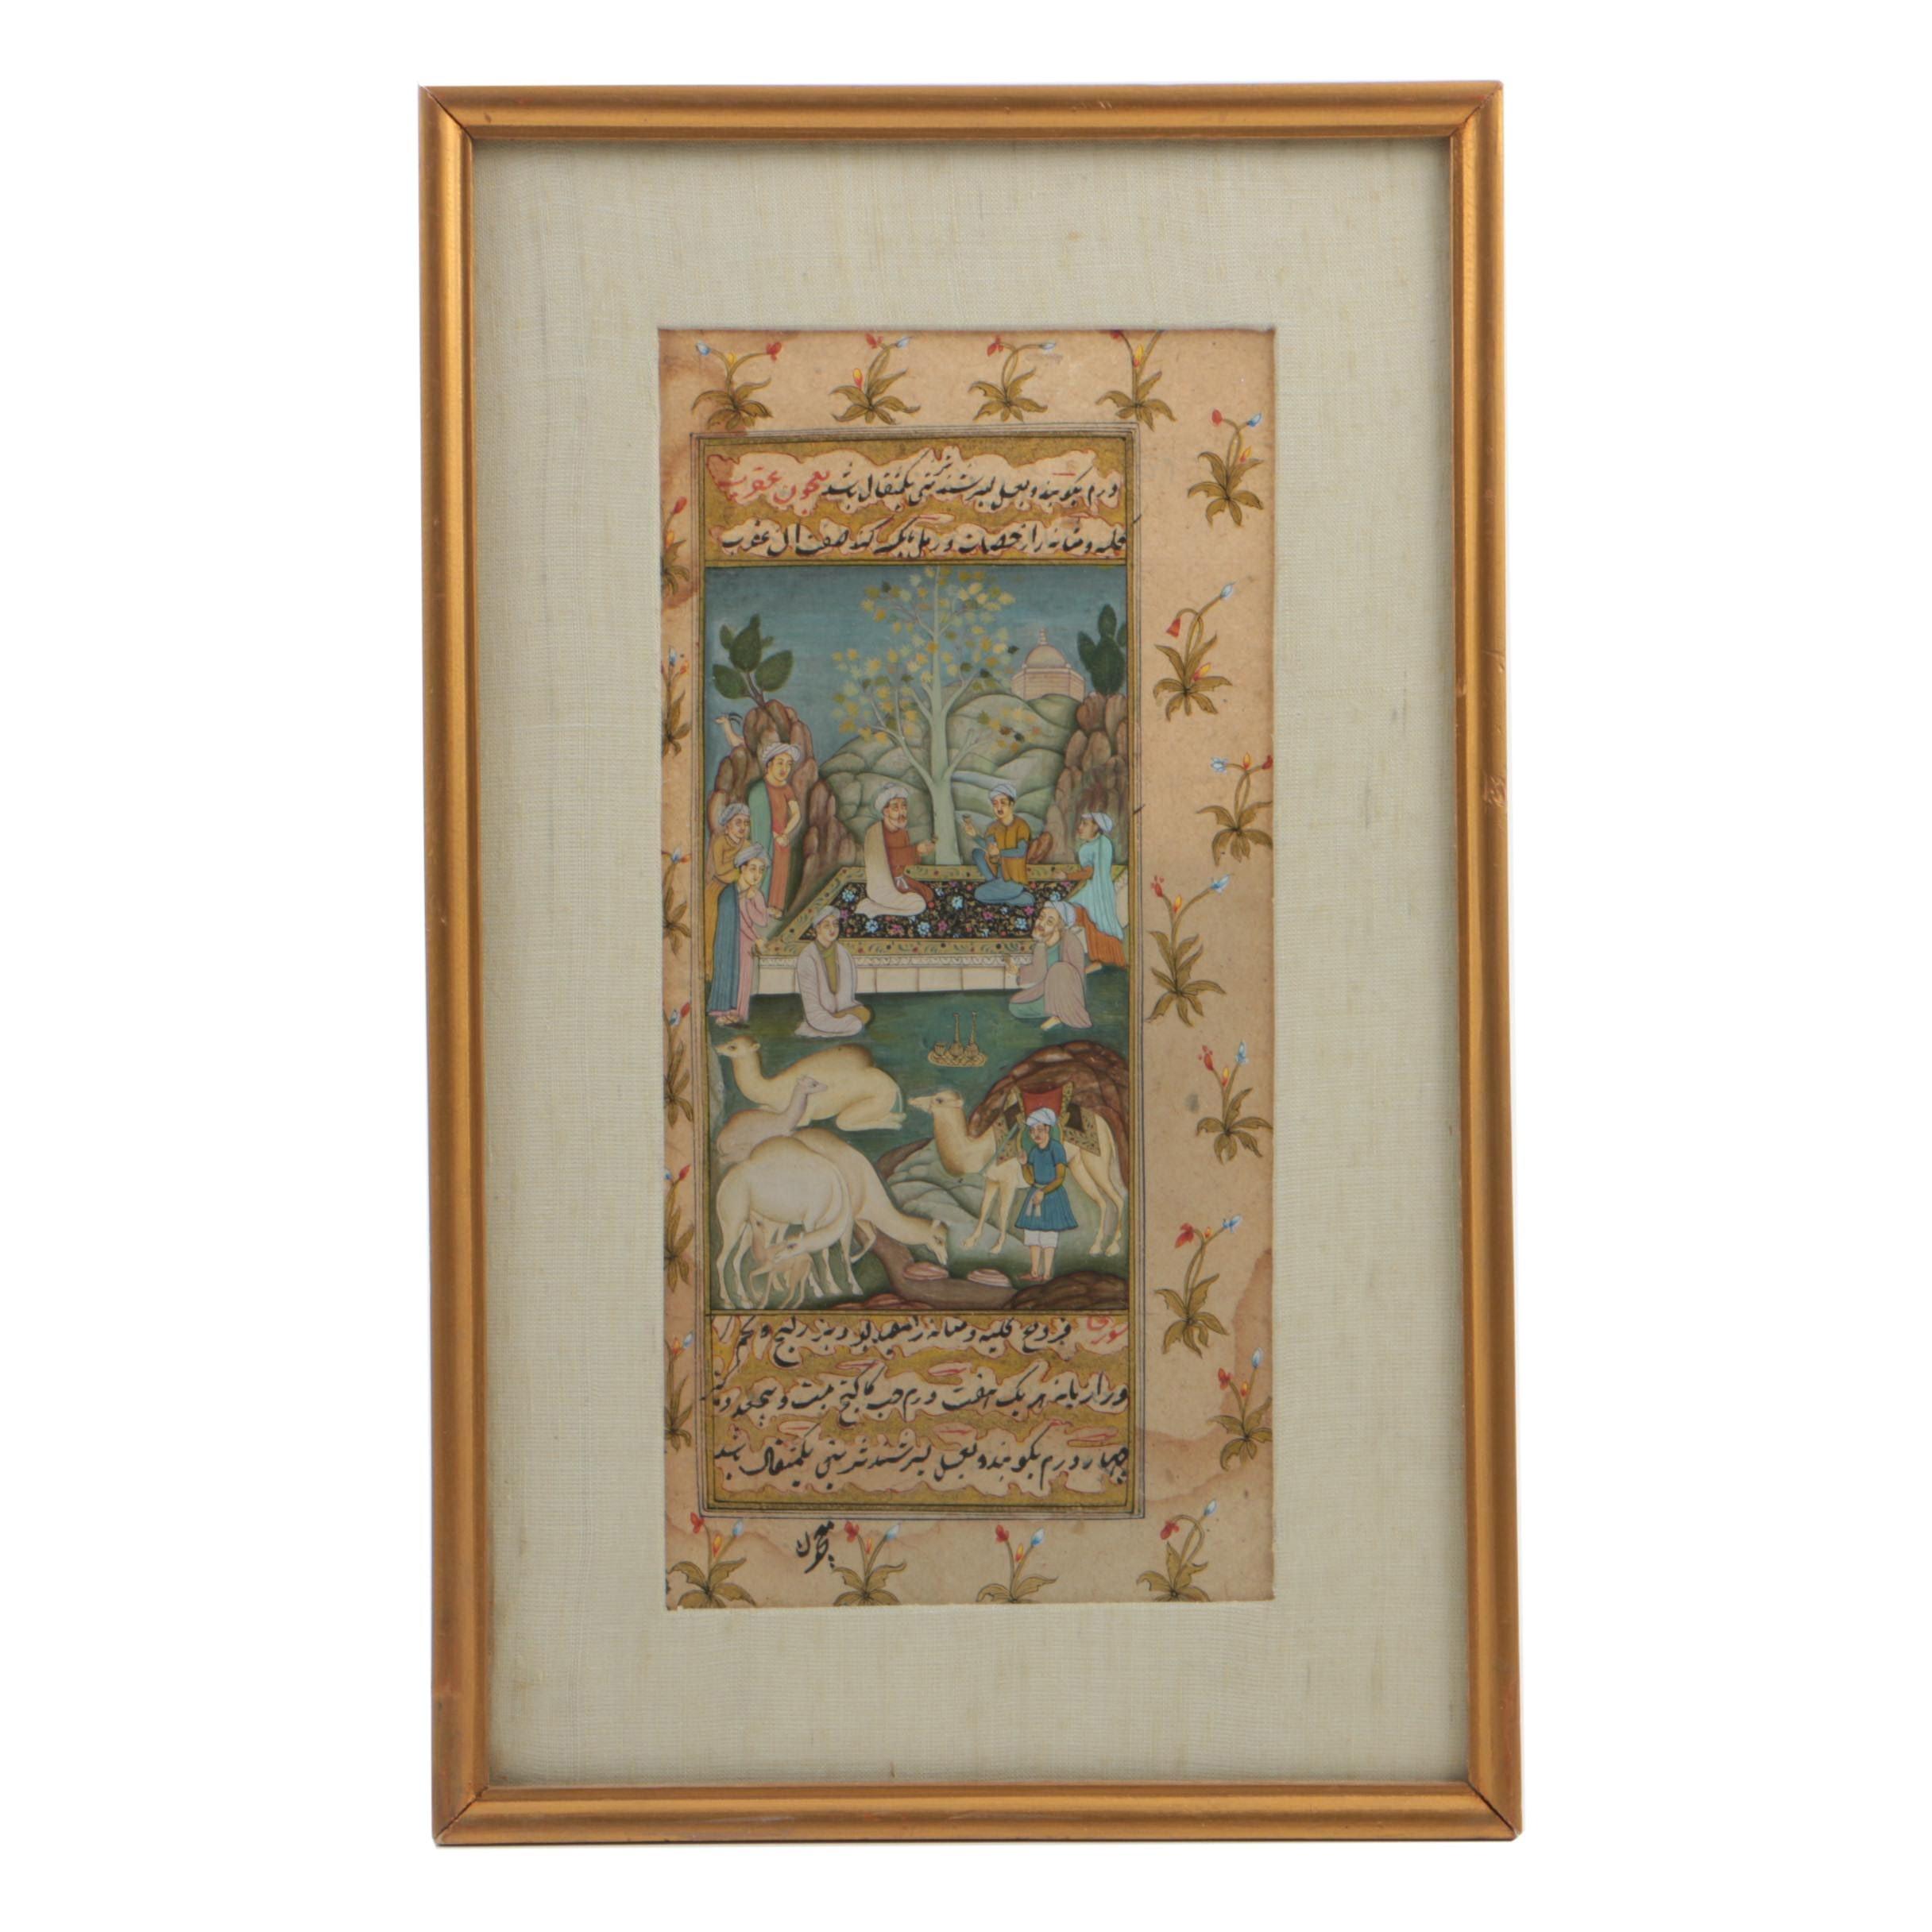 19th Century Persian Illuminated Manuscript